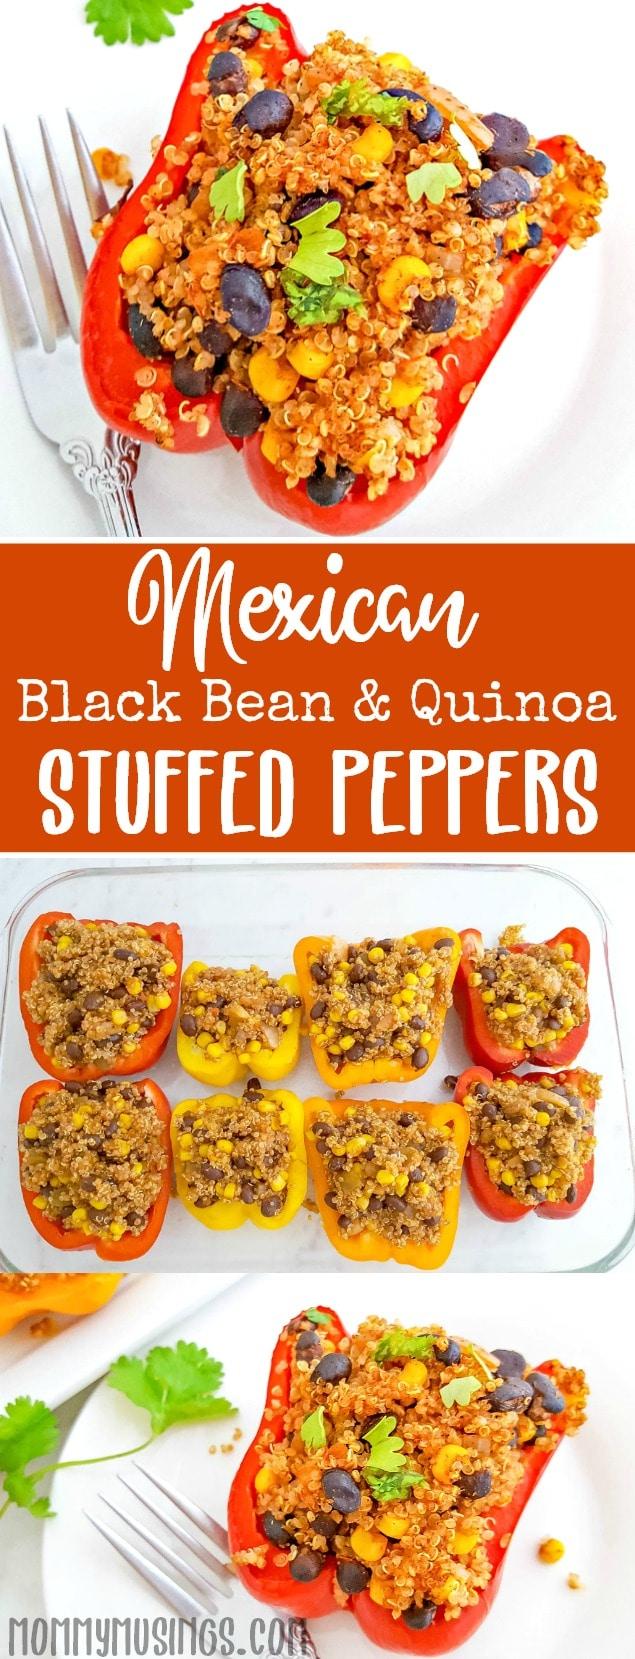 Mexican Black Bean & Quinoa Stuffed Peppers